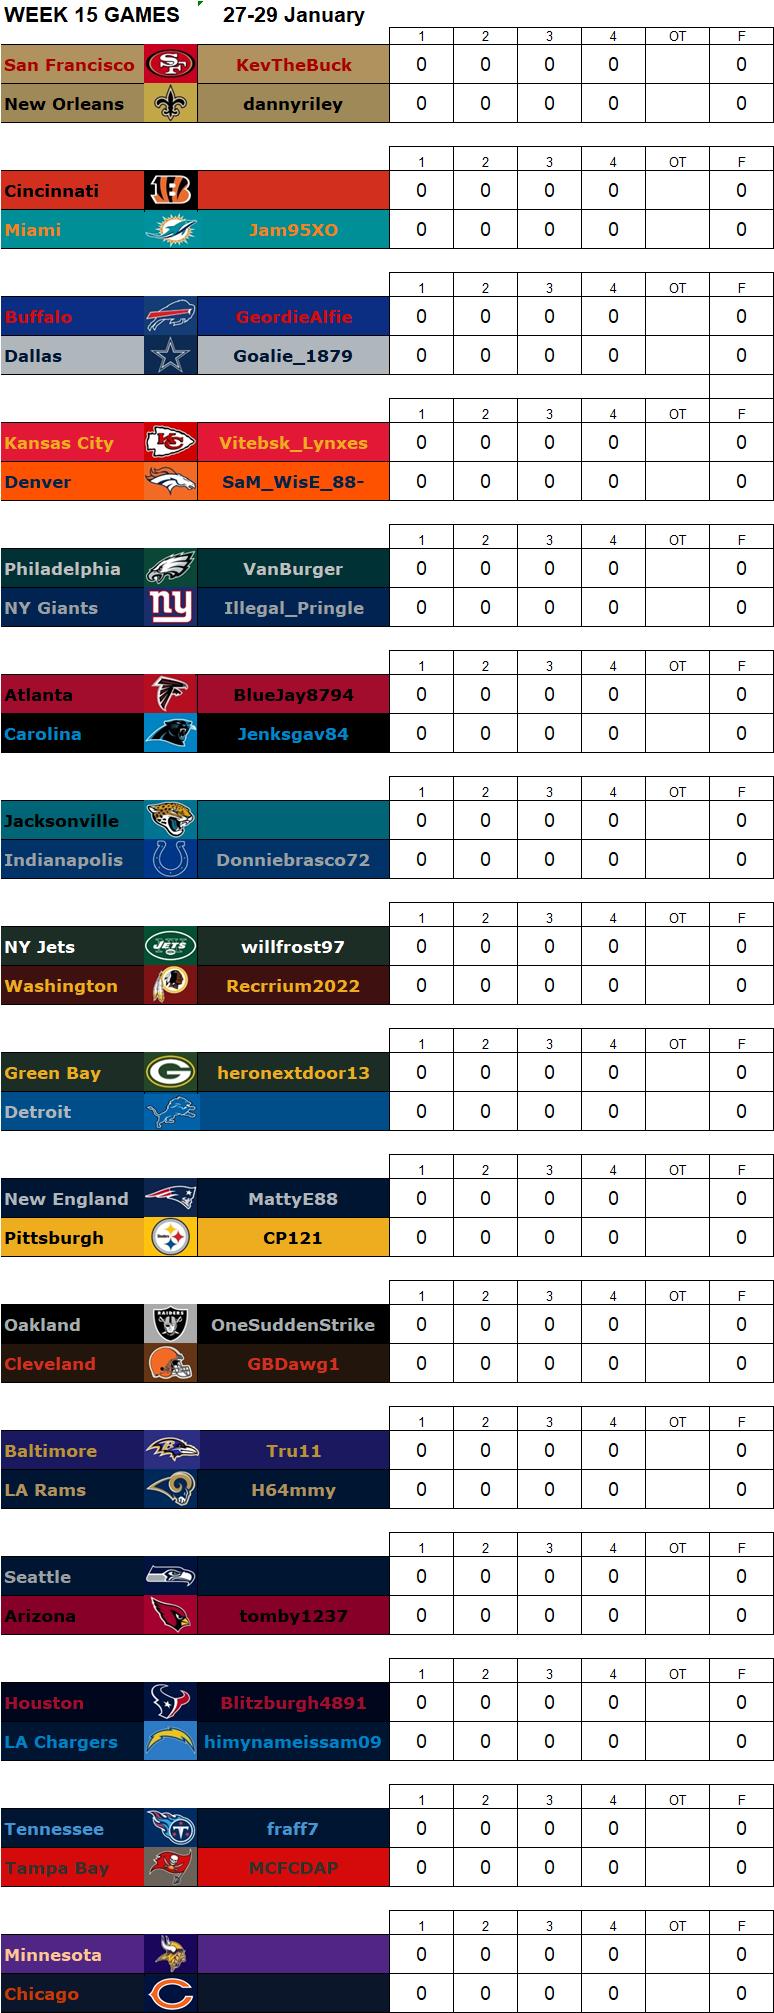 Week 15 Matchups, 27-29 January W15g14